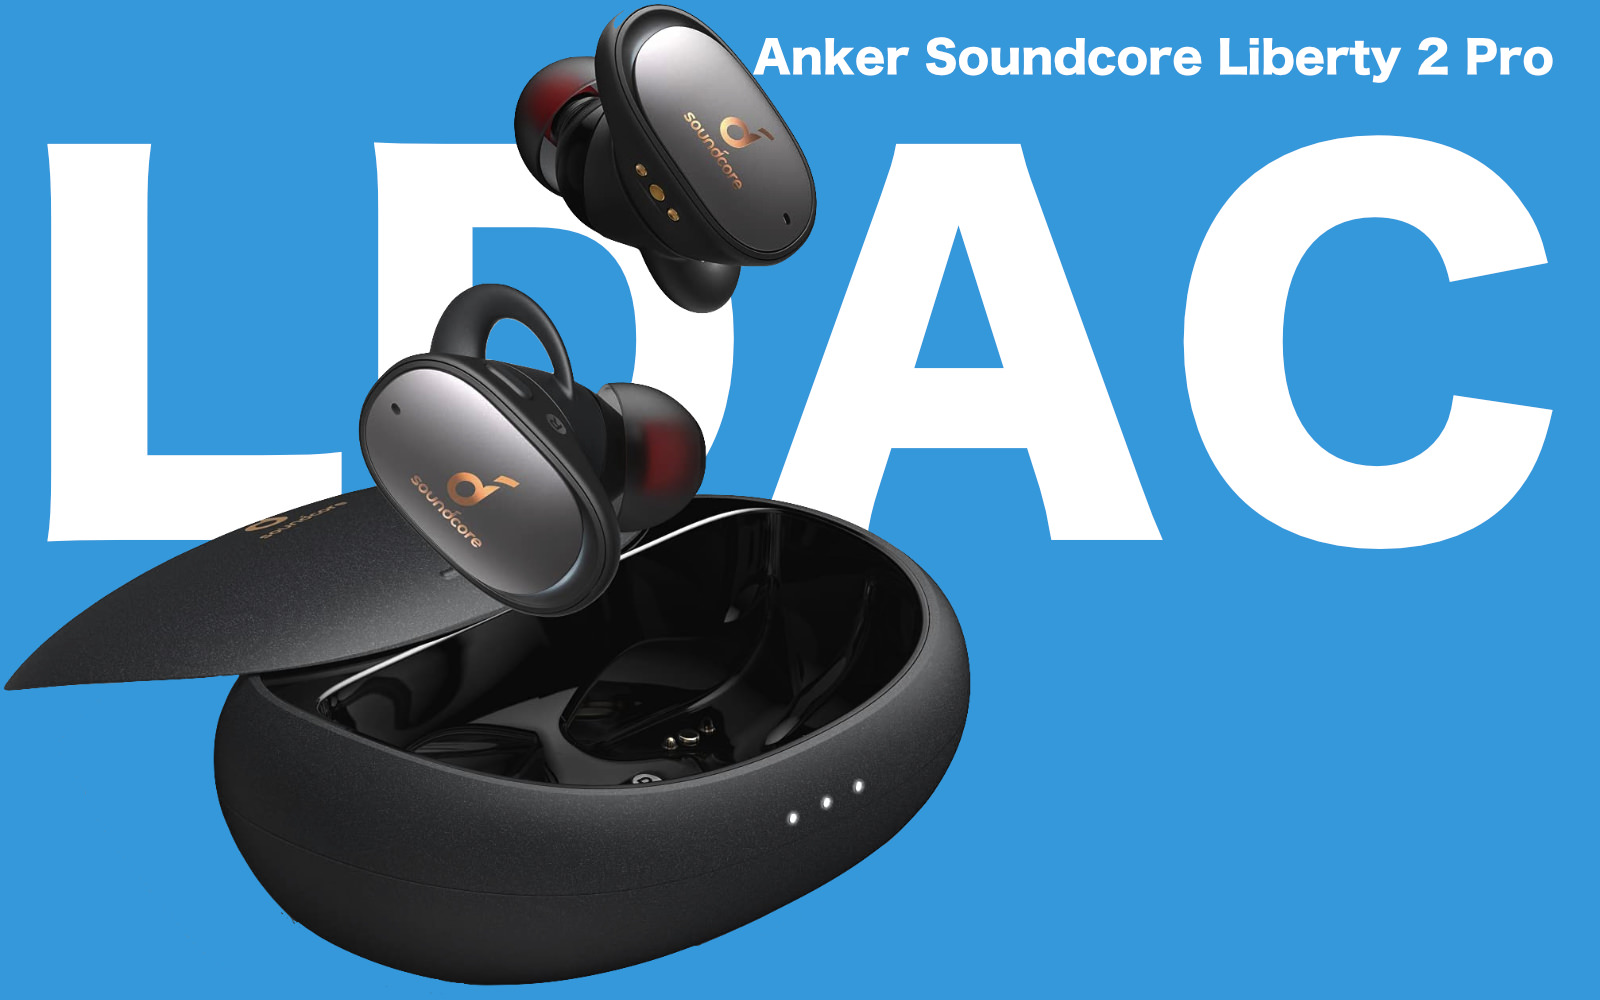 Anker Soundcore Liberty 2 Pro LDAC